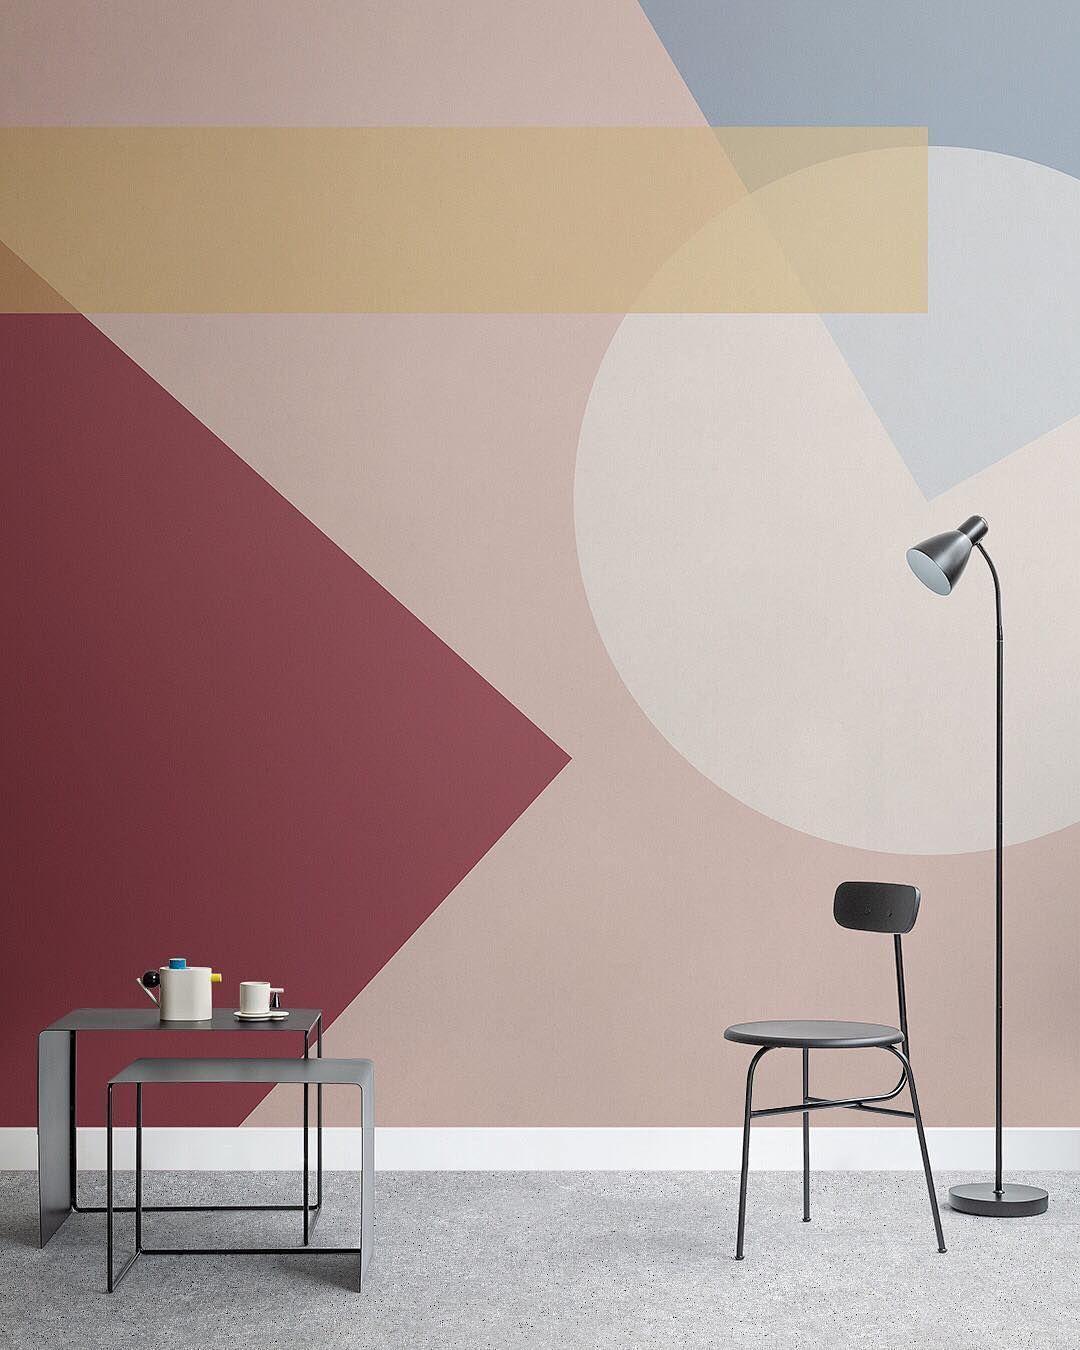 Office Room Design Software: #art Deco Interior Design #interior Design Kitchen #free